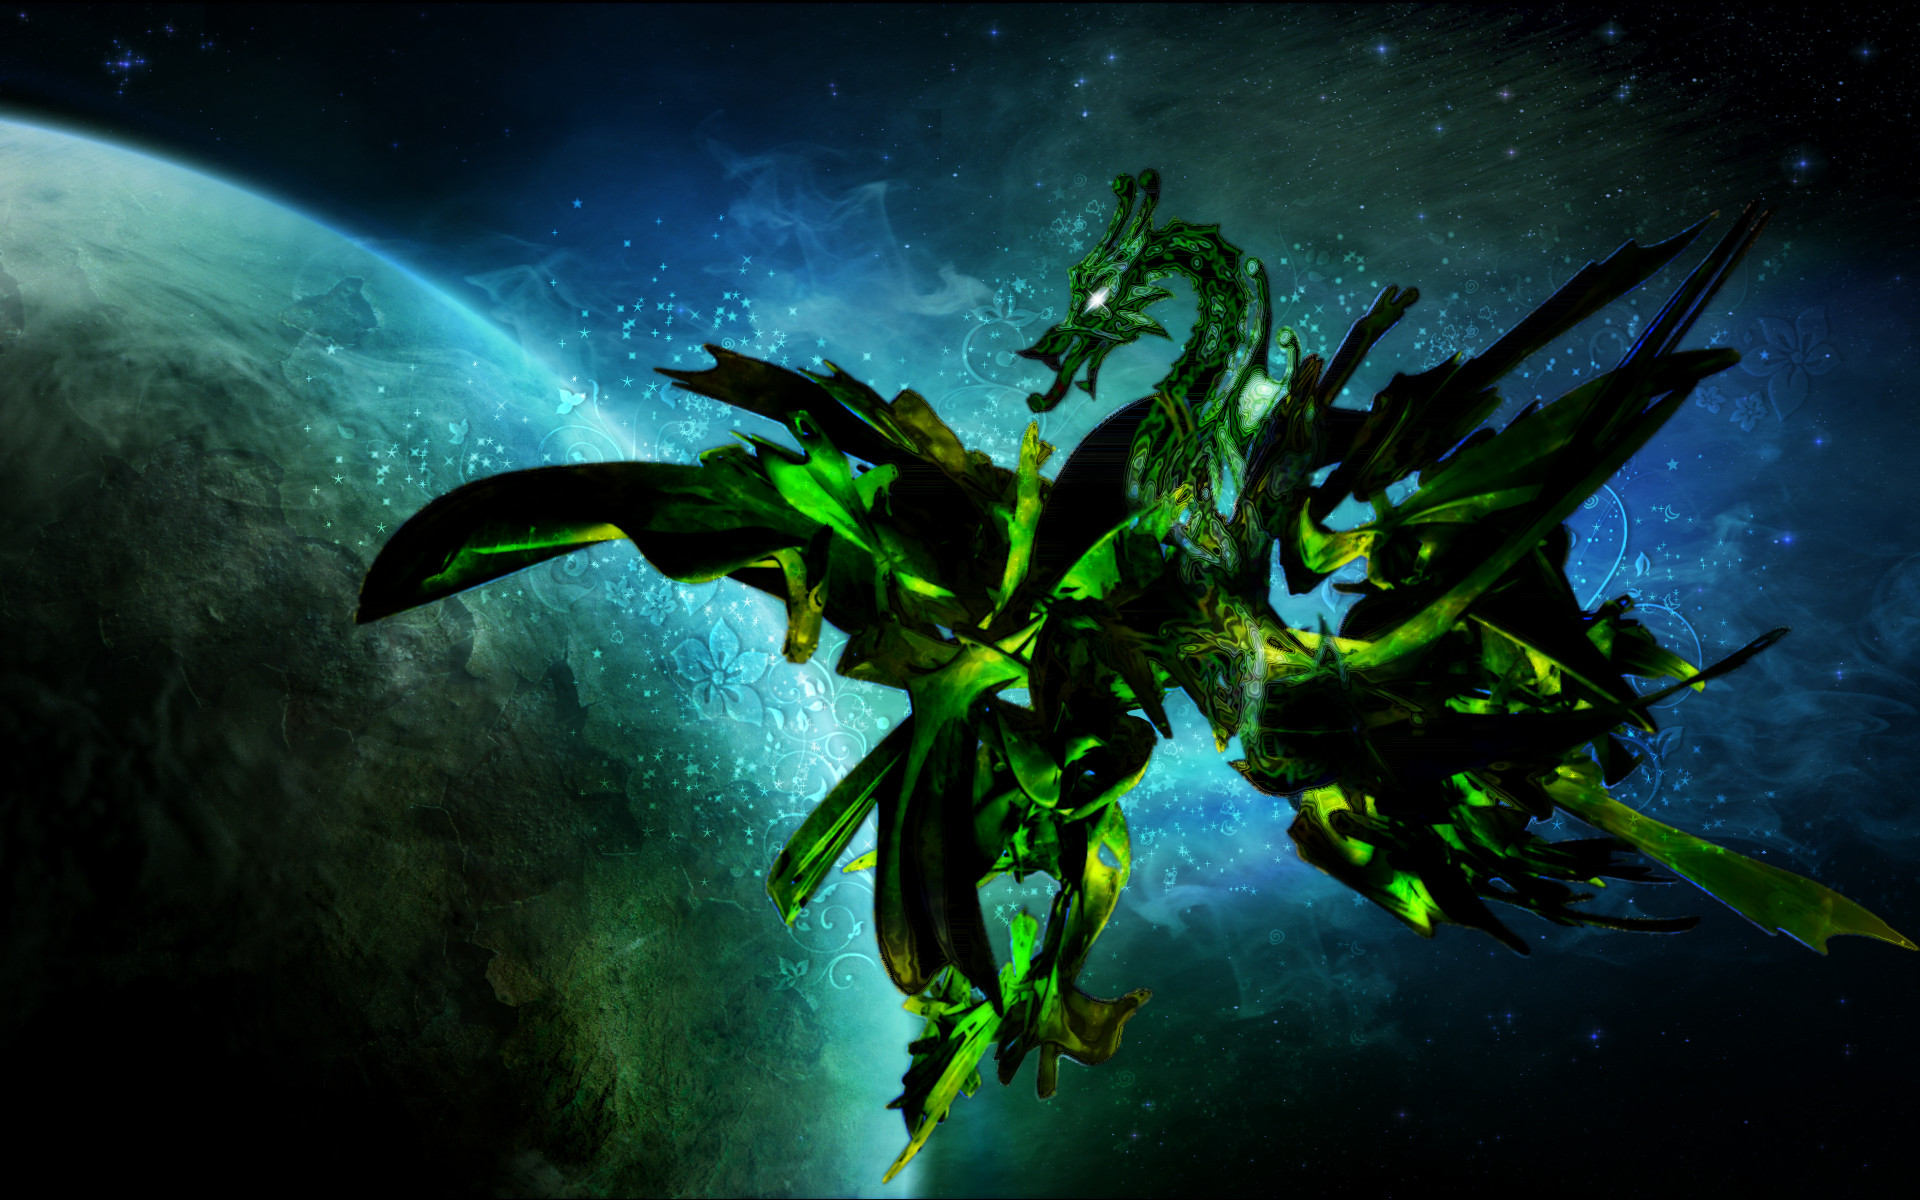 Dragons Dragon Fantasy Title Spots wallpapers HD free – 265412